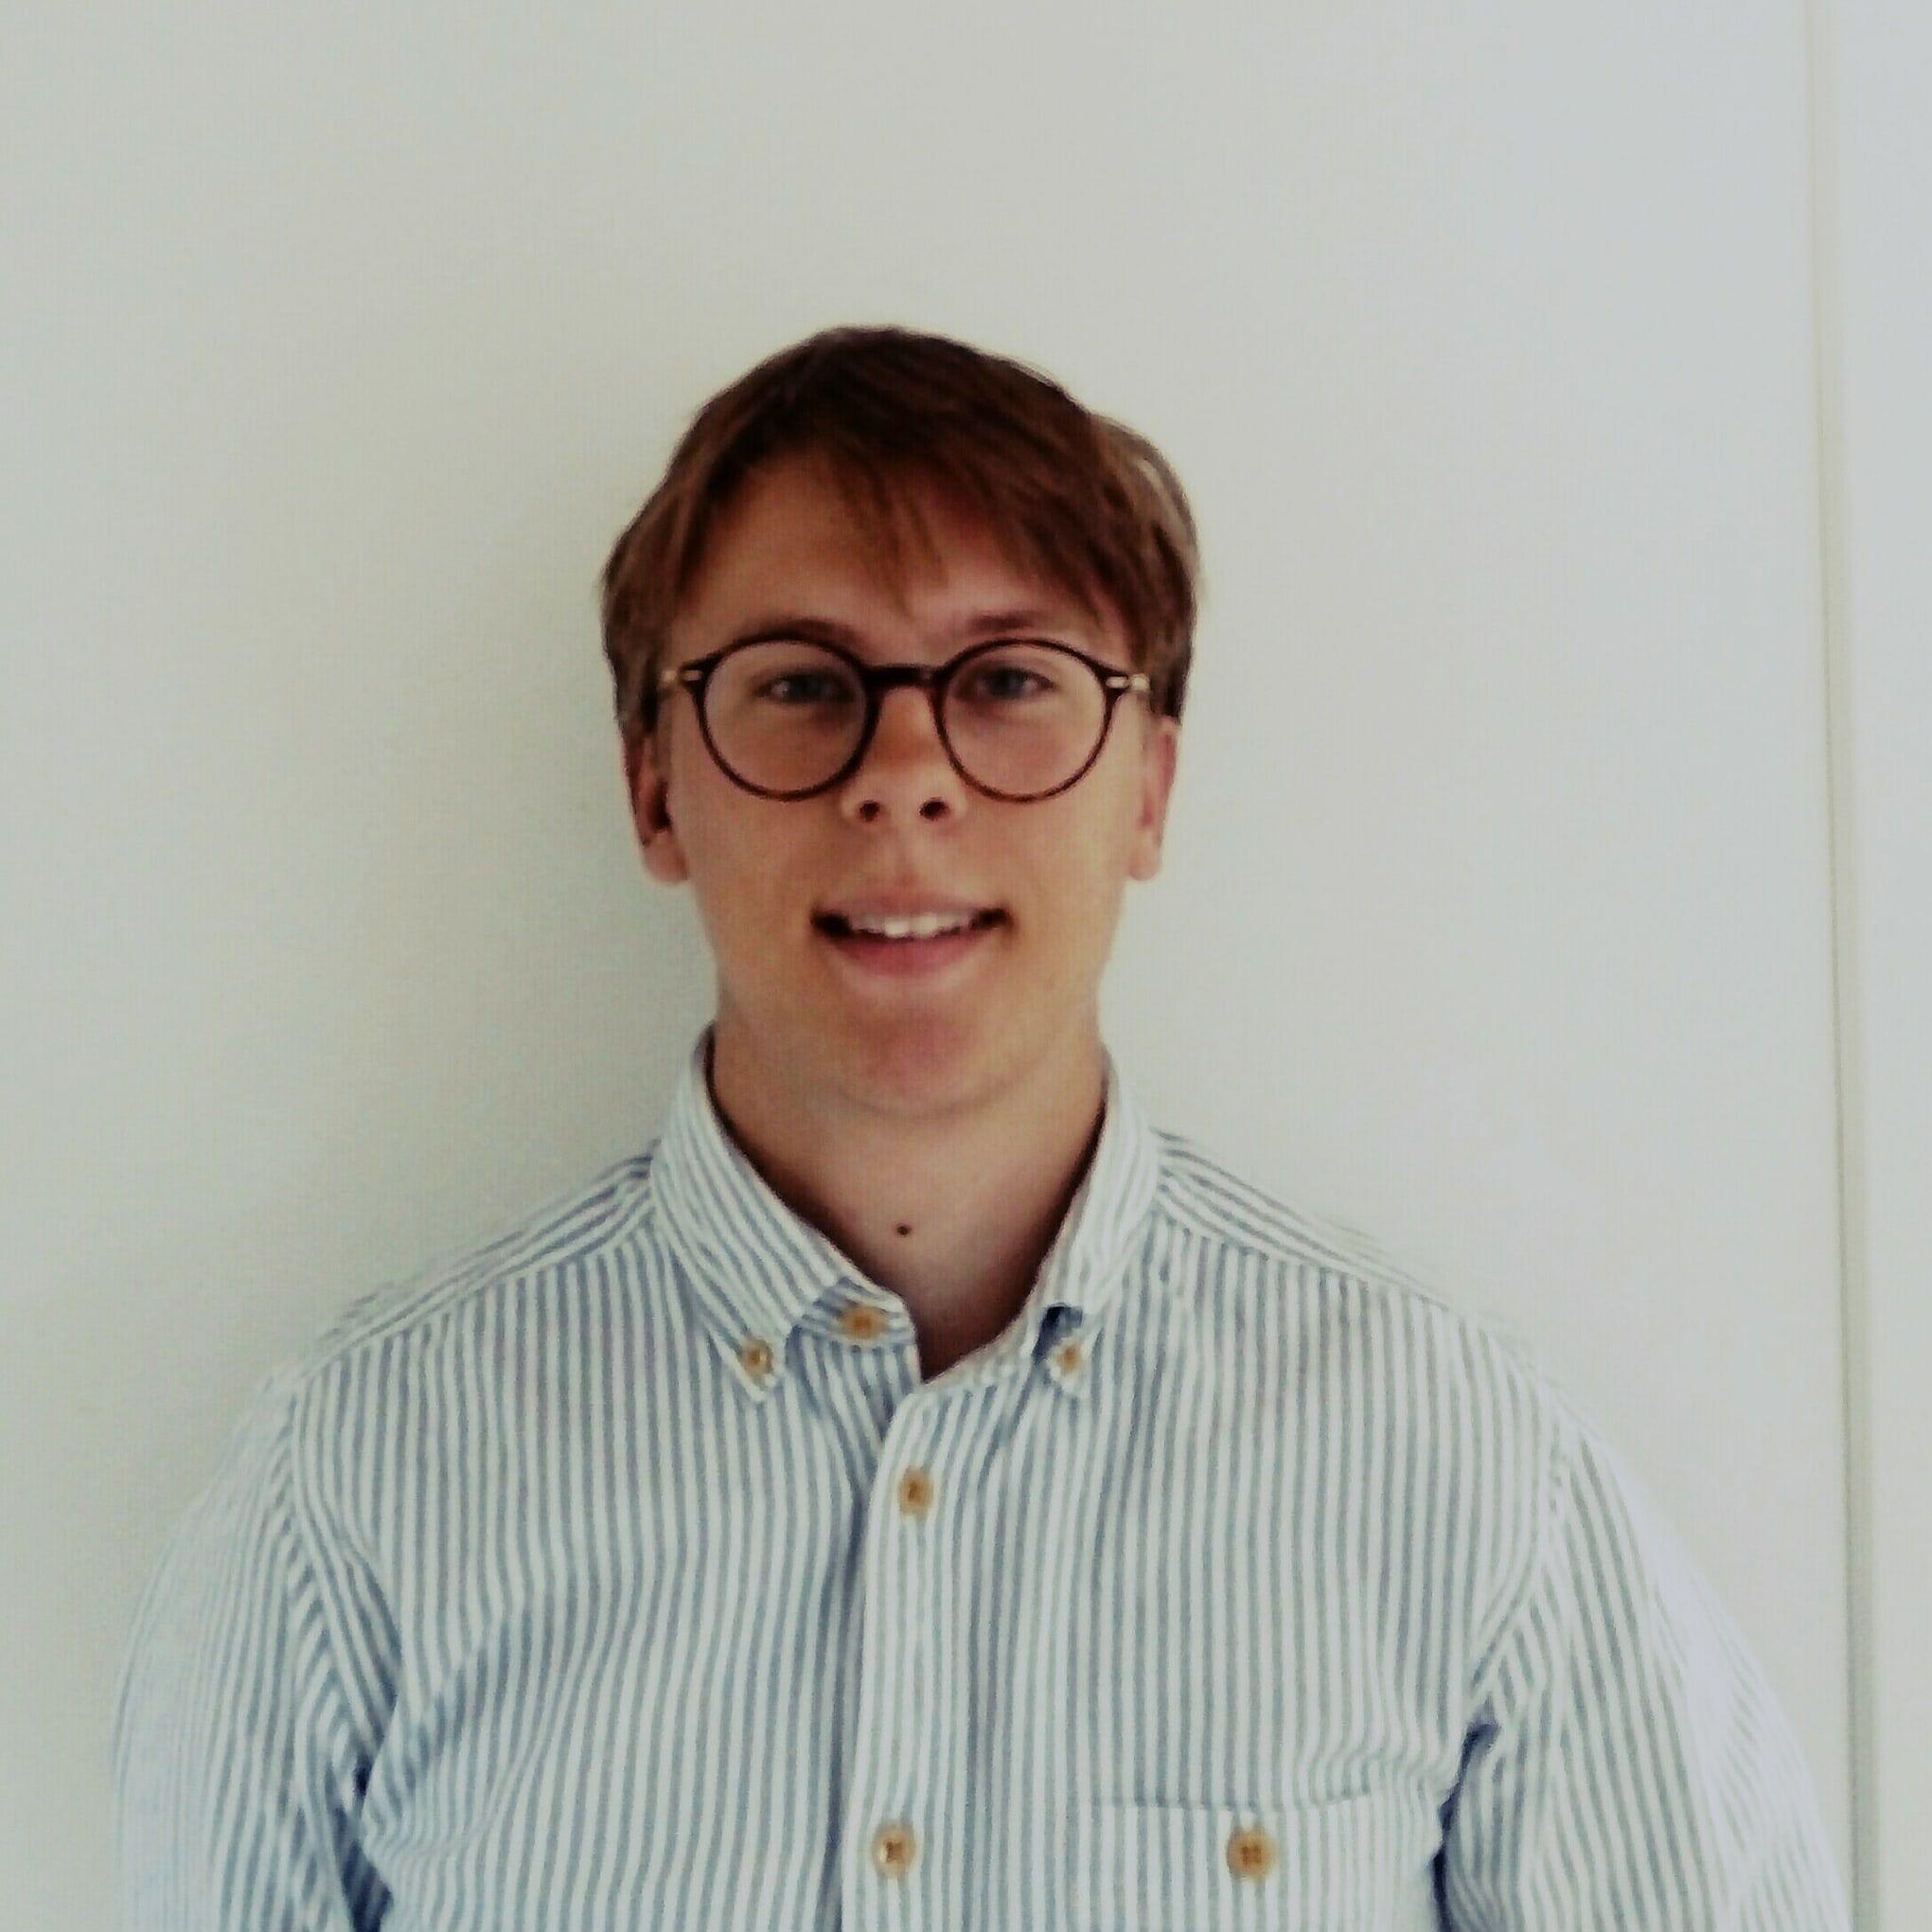 Frederik Kej Jønsson